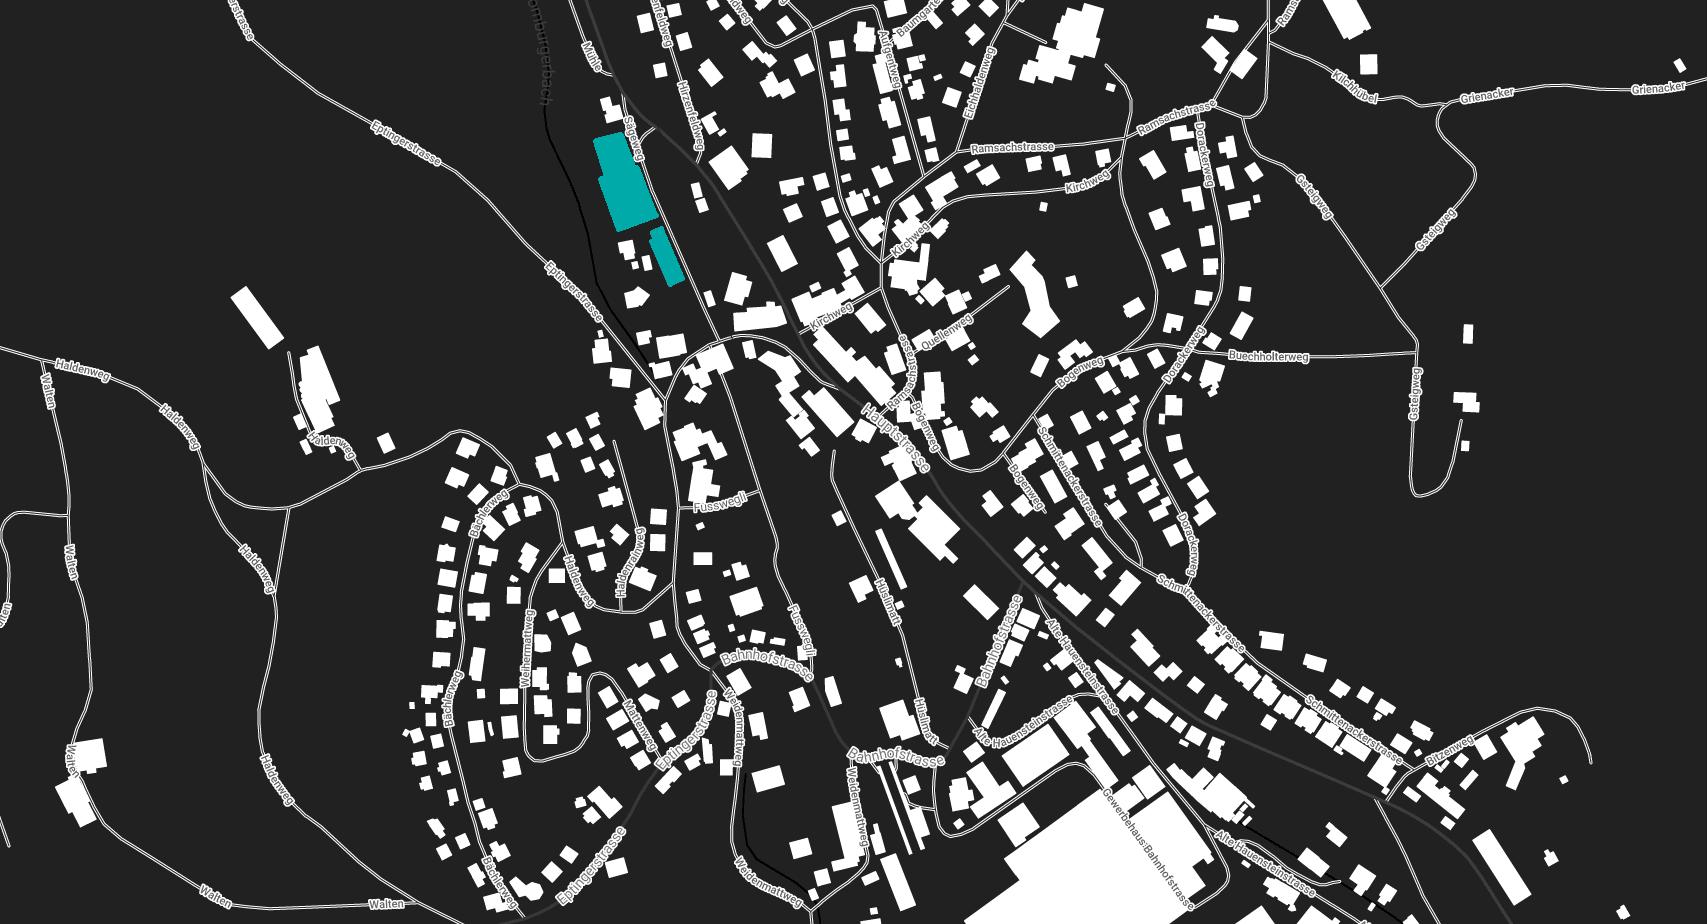 HRAG Karte Läufelfingen Baselland